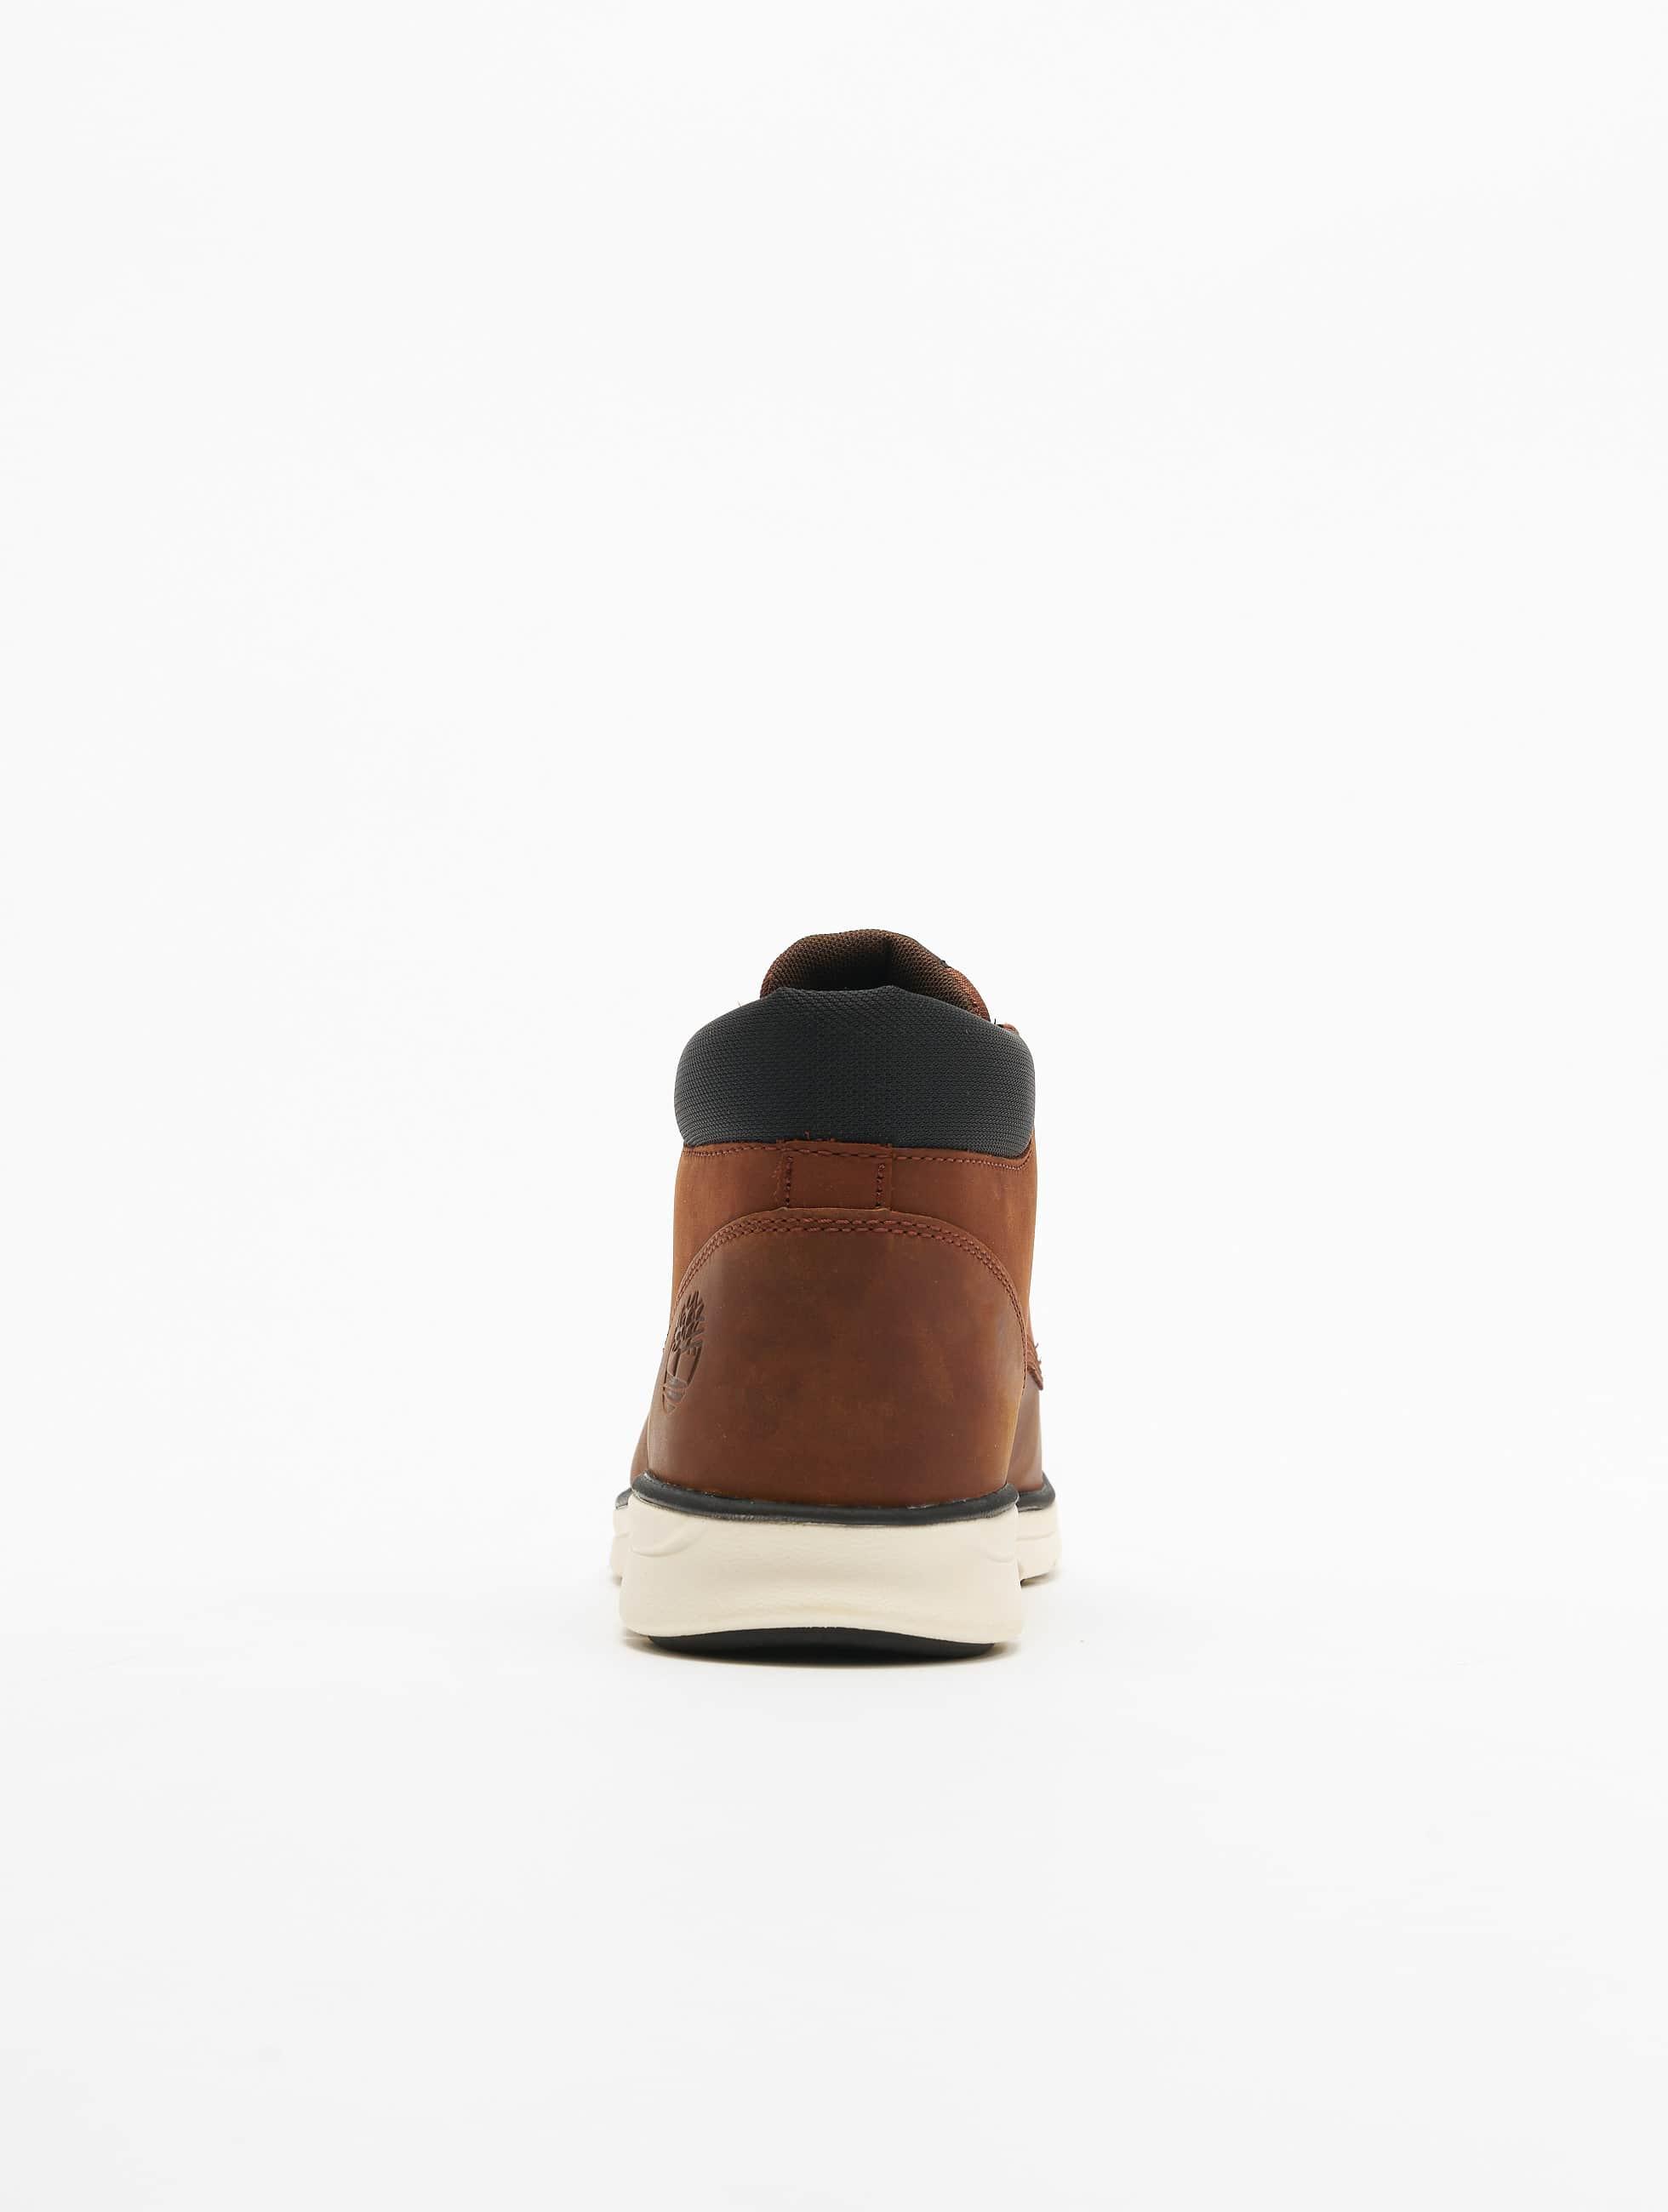 Timberland Zapatillas de deporte Bradstreet Chukka Leather marrón